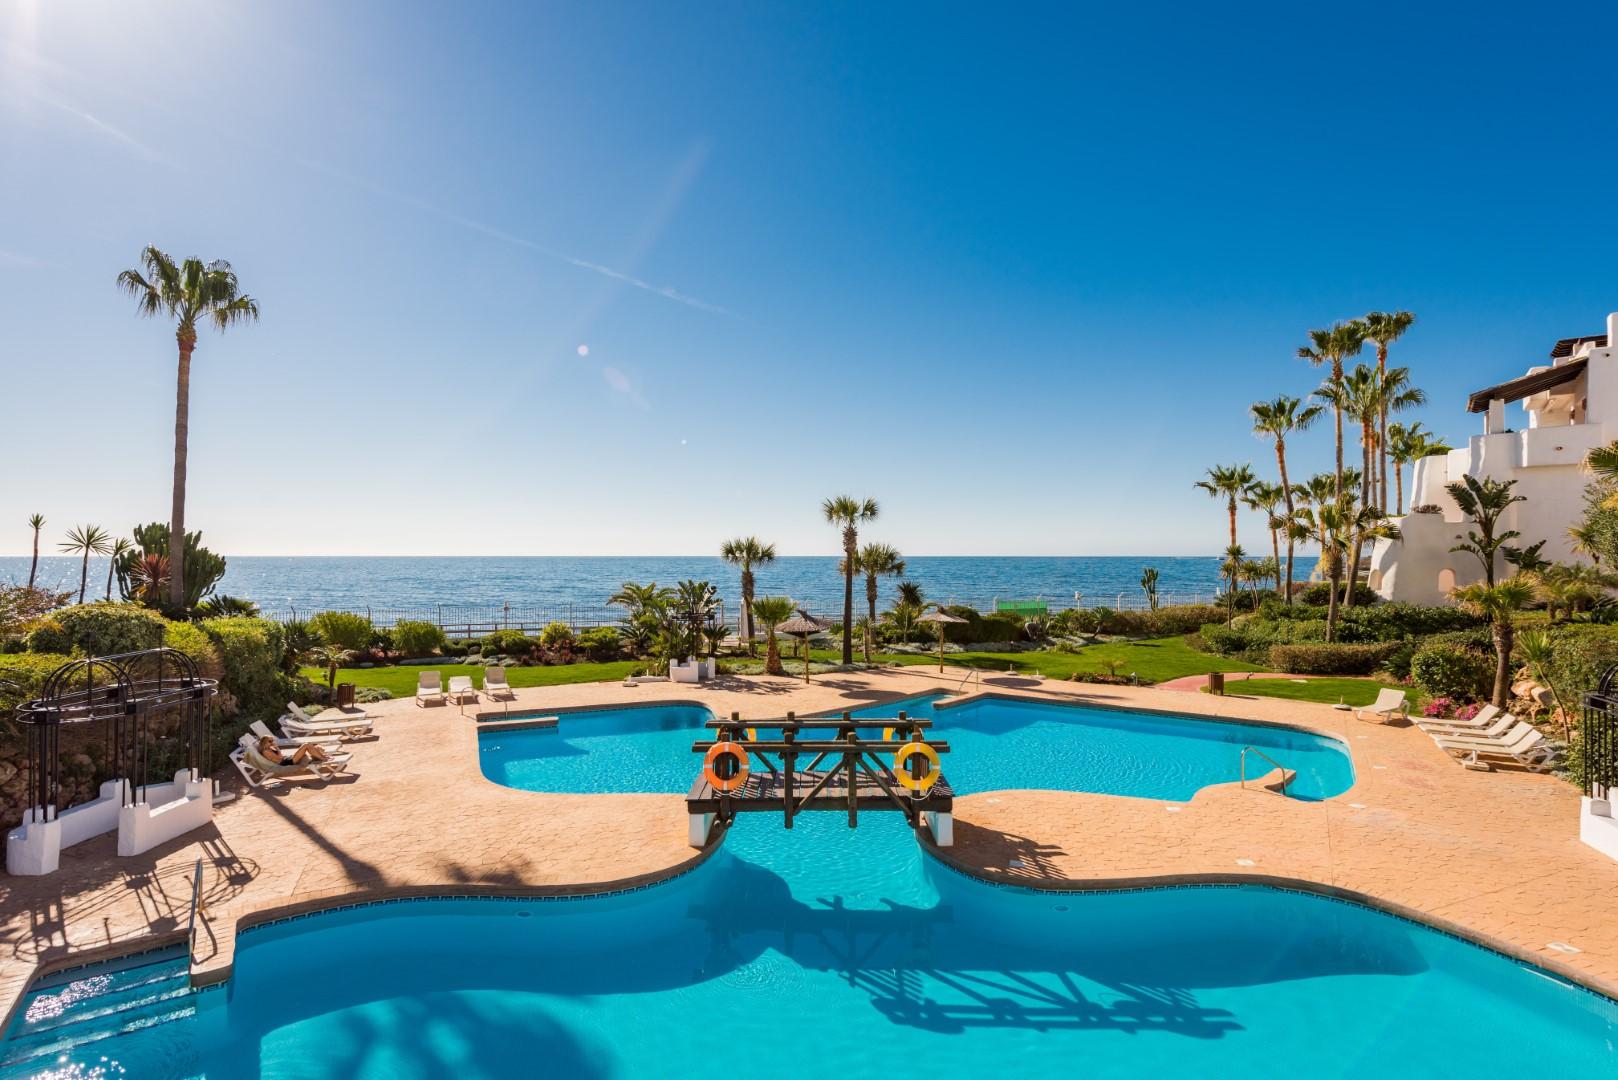 Marbella Real Estate News – November 2018